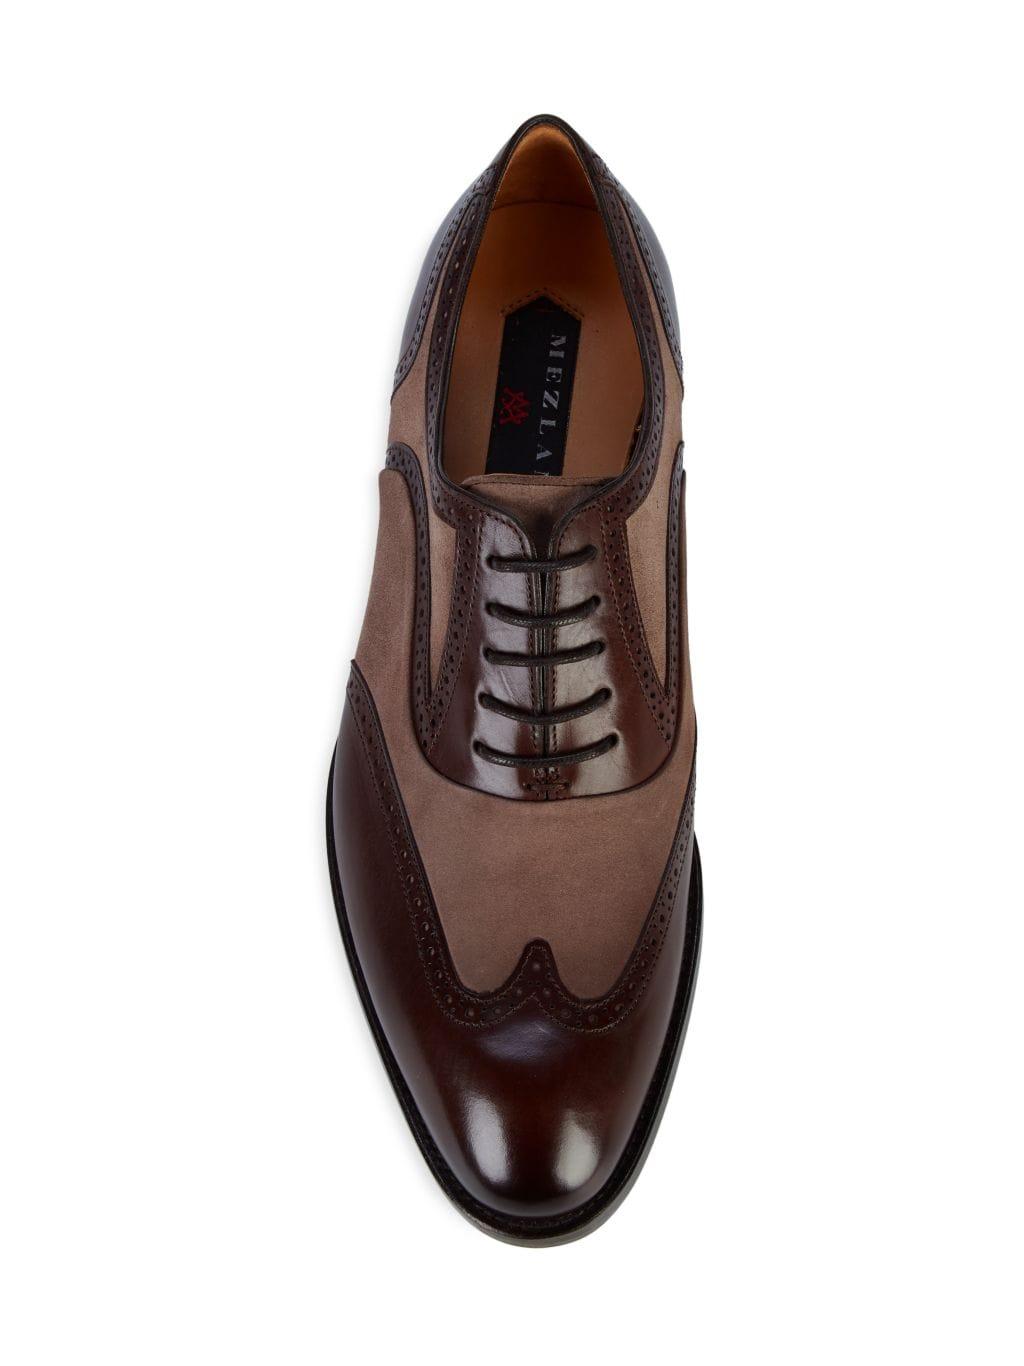 Mezlan Cantone Suede & Leather Oxfords